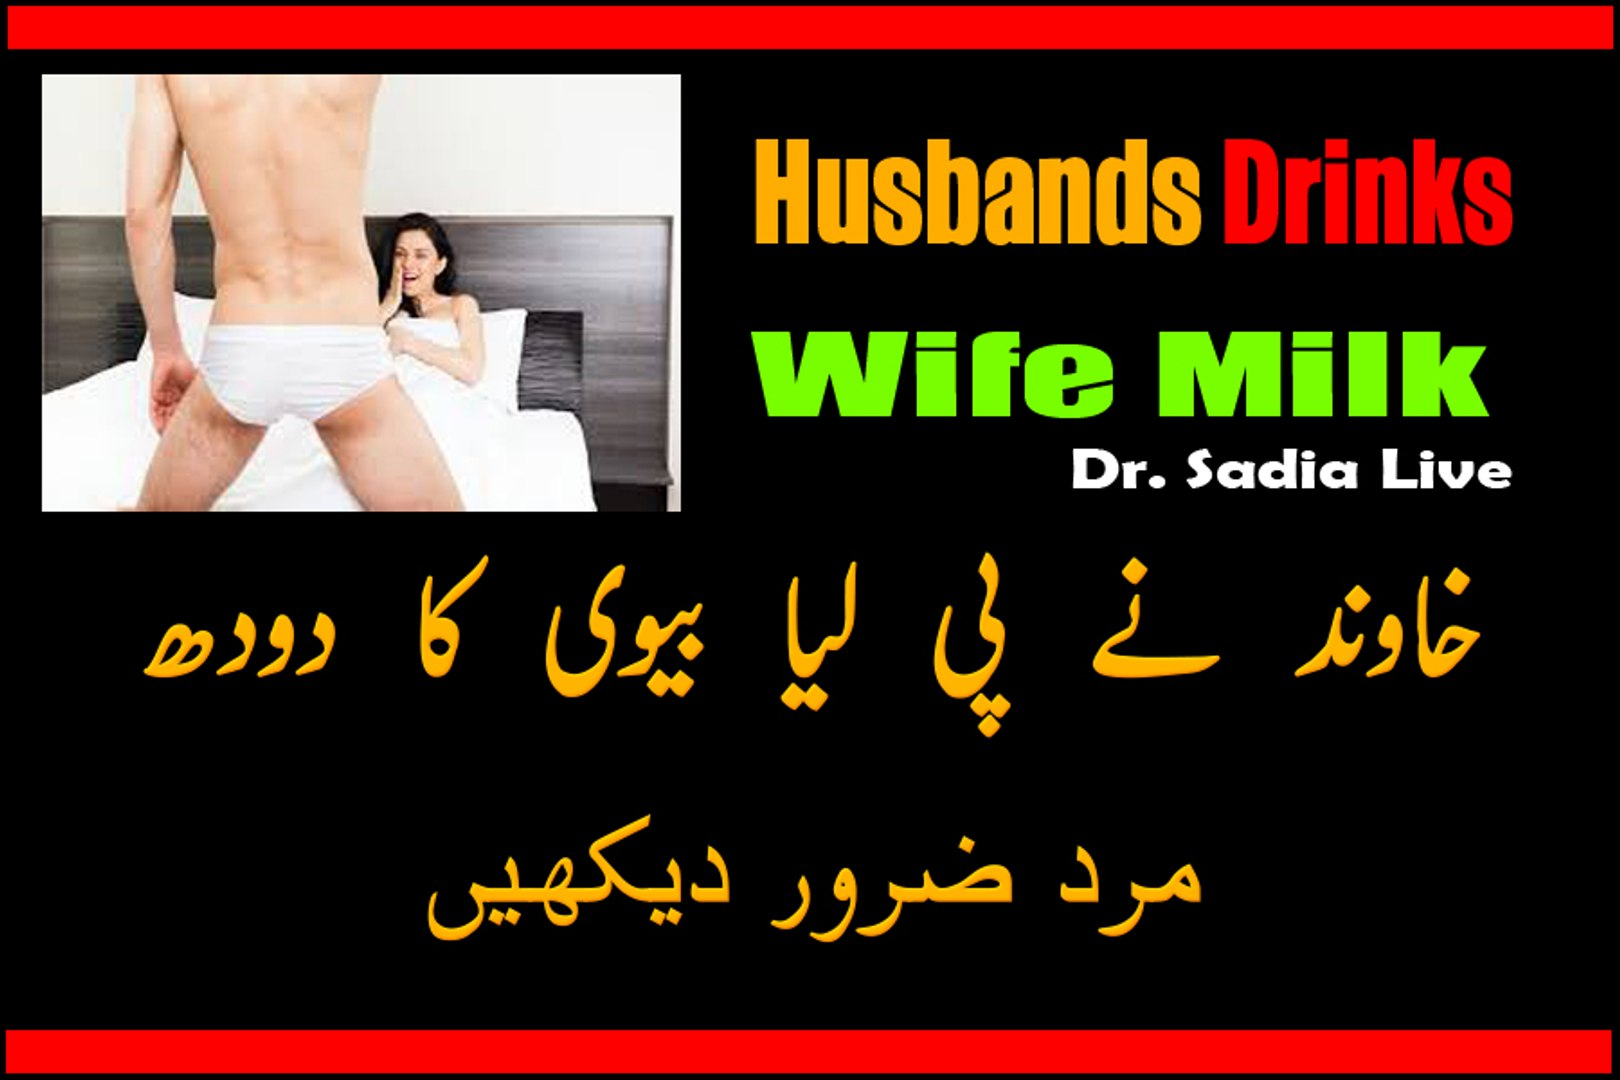 Breastfeeding wife's milk | biwi ka doodh piya | Dr  Sadia Live